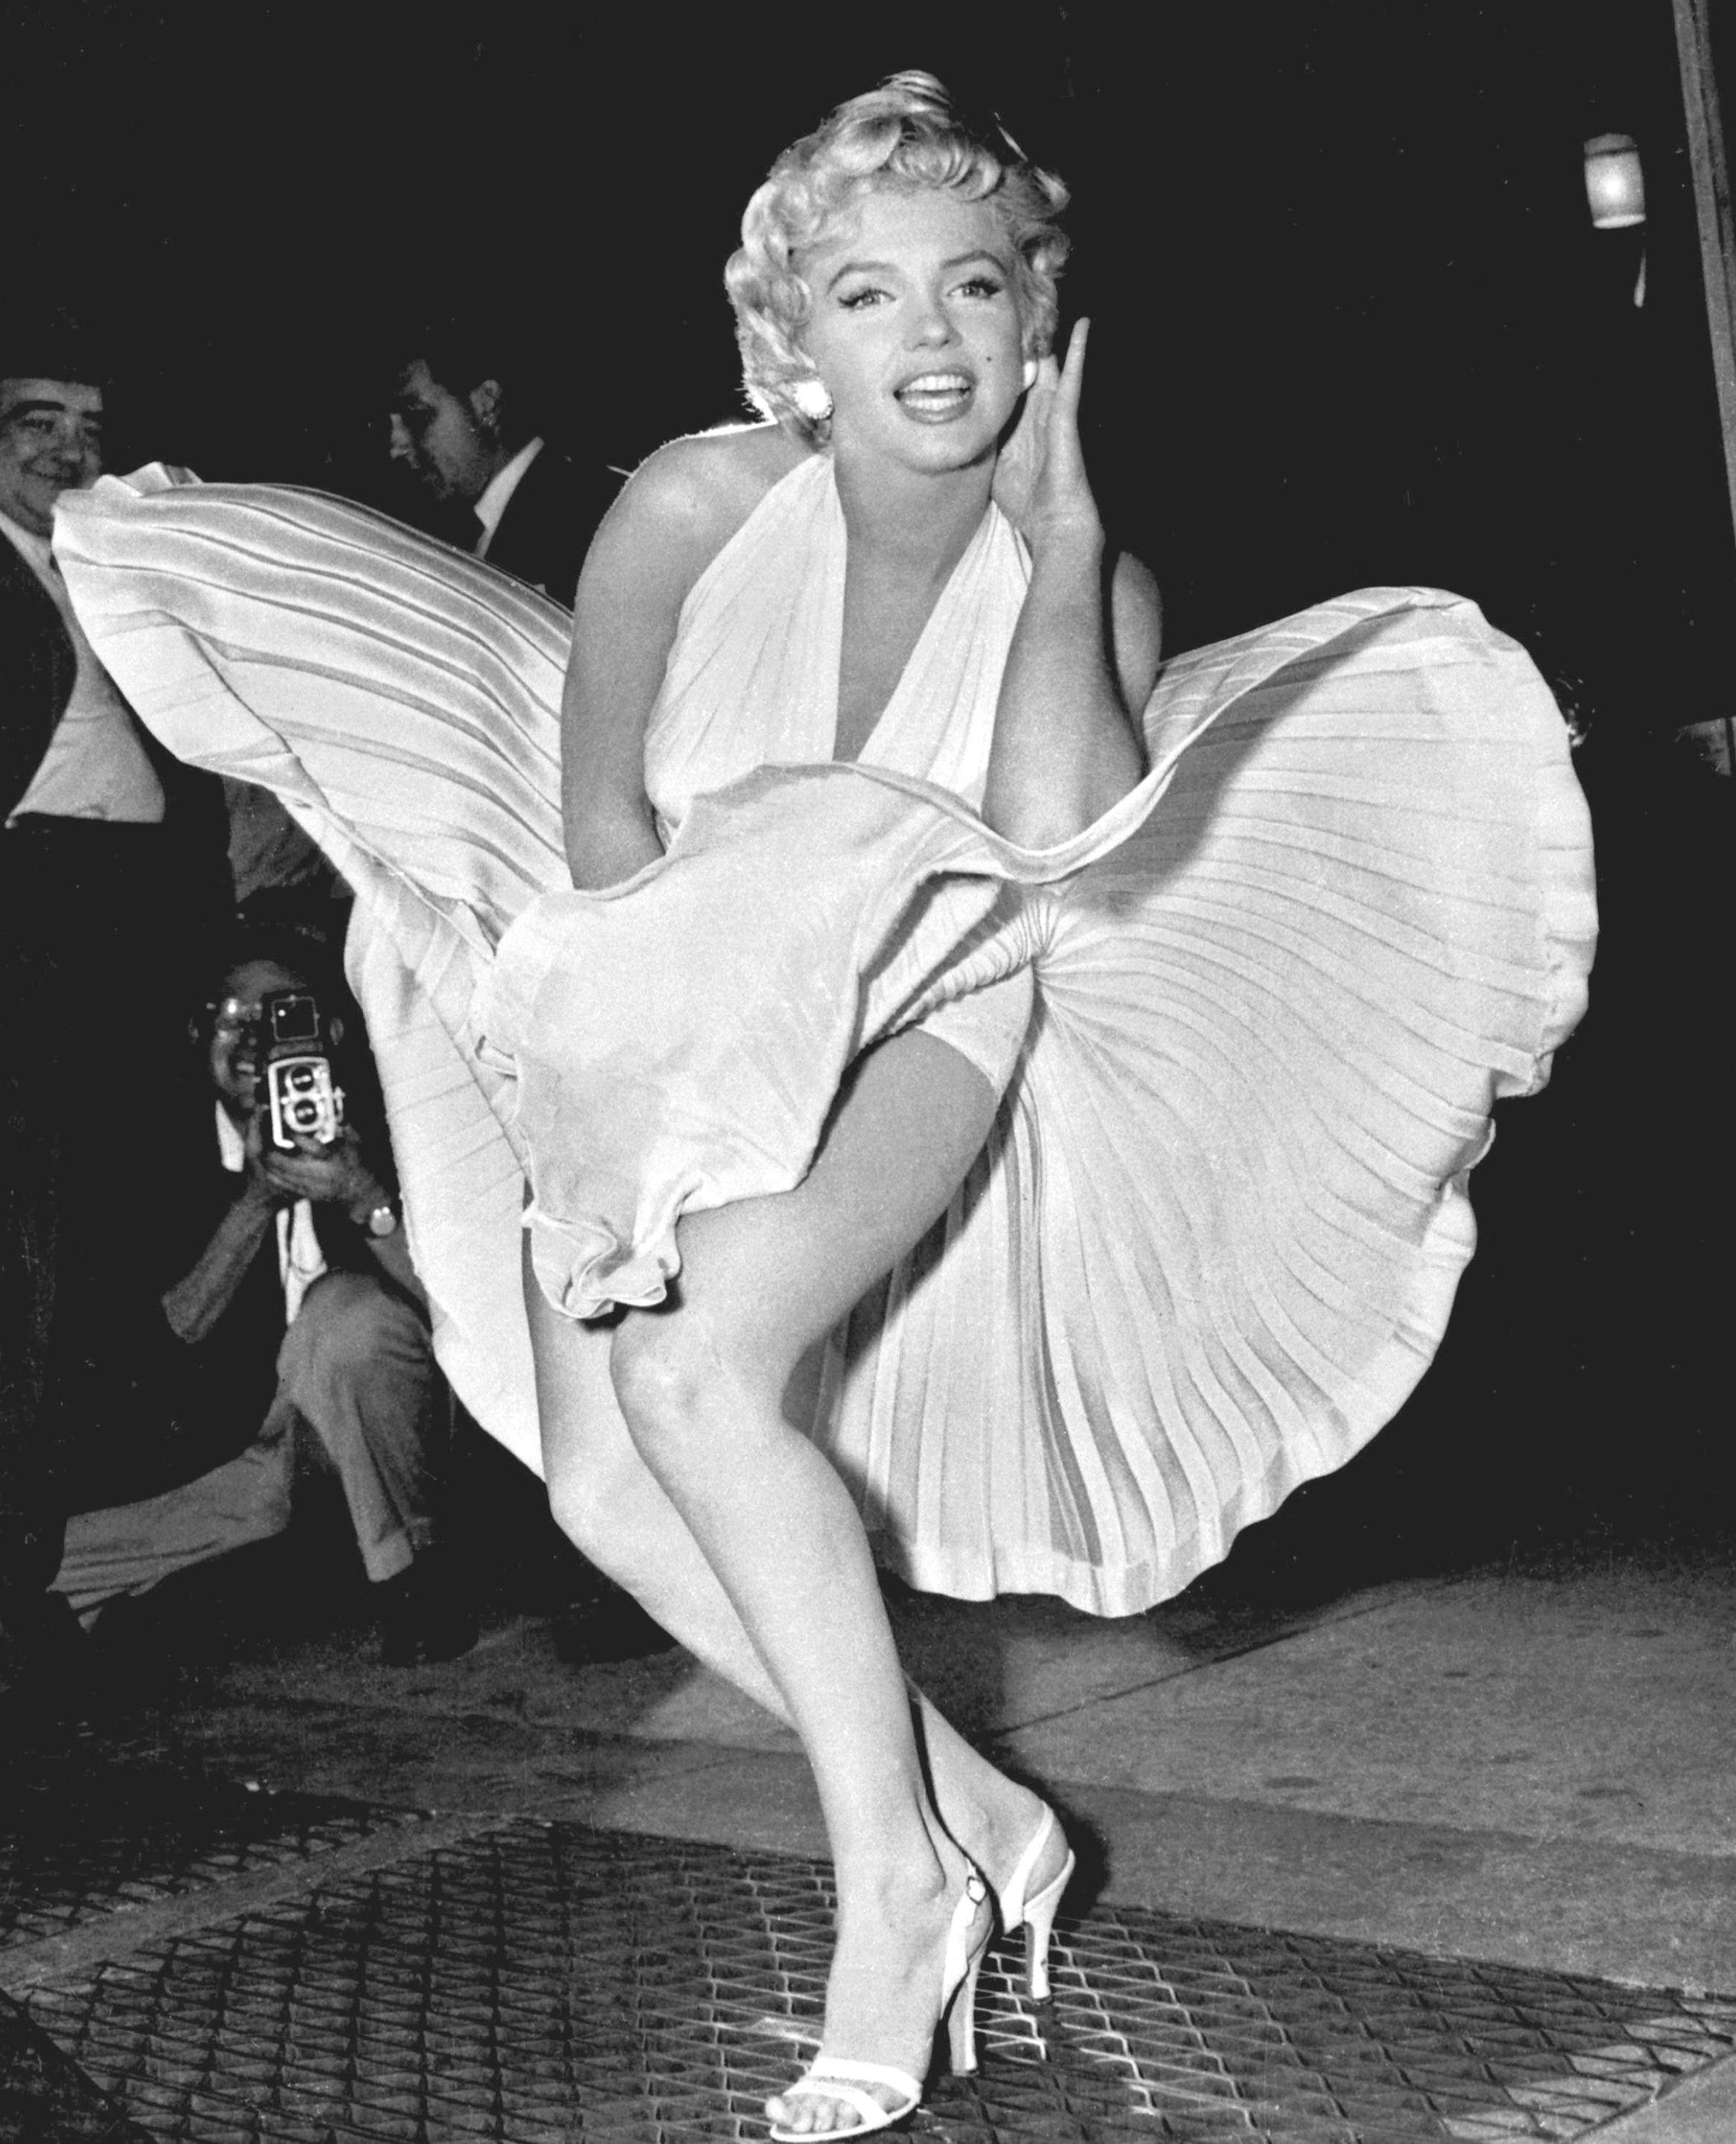 Marilyn Monroe filma famosa cena do vestido voando | Marilyn Monroe ...